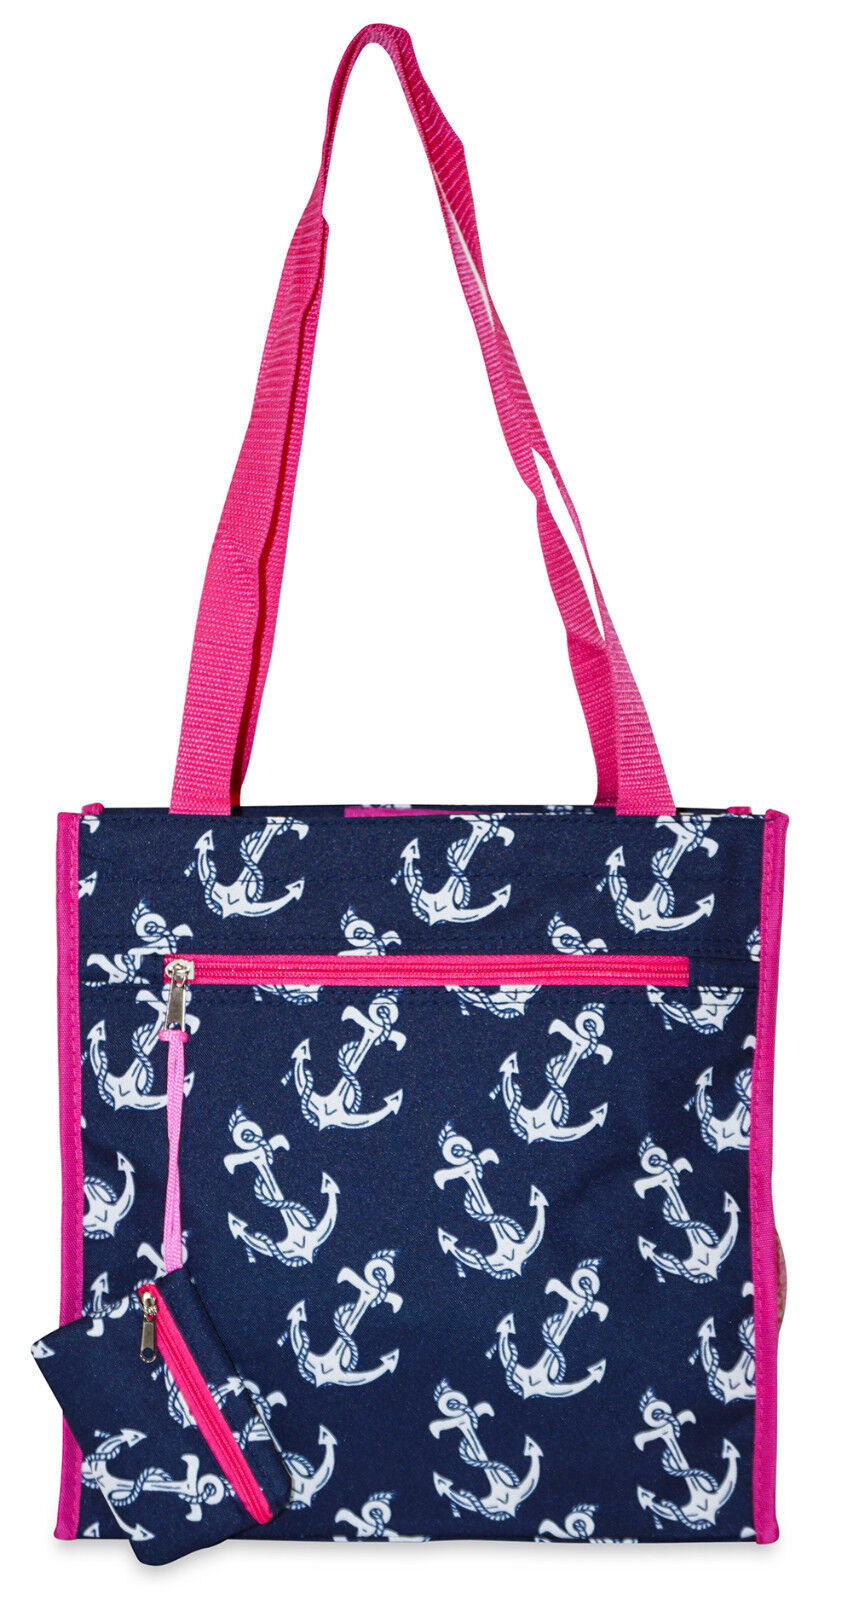 Anchor Womens Small Tote Bag Handbag Purse for Travel Work S